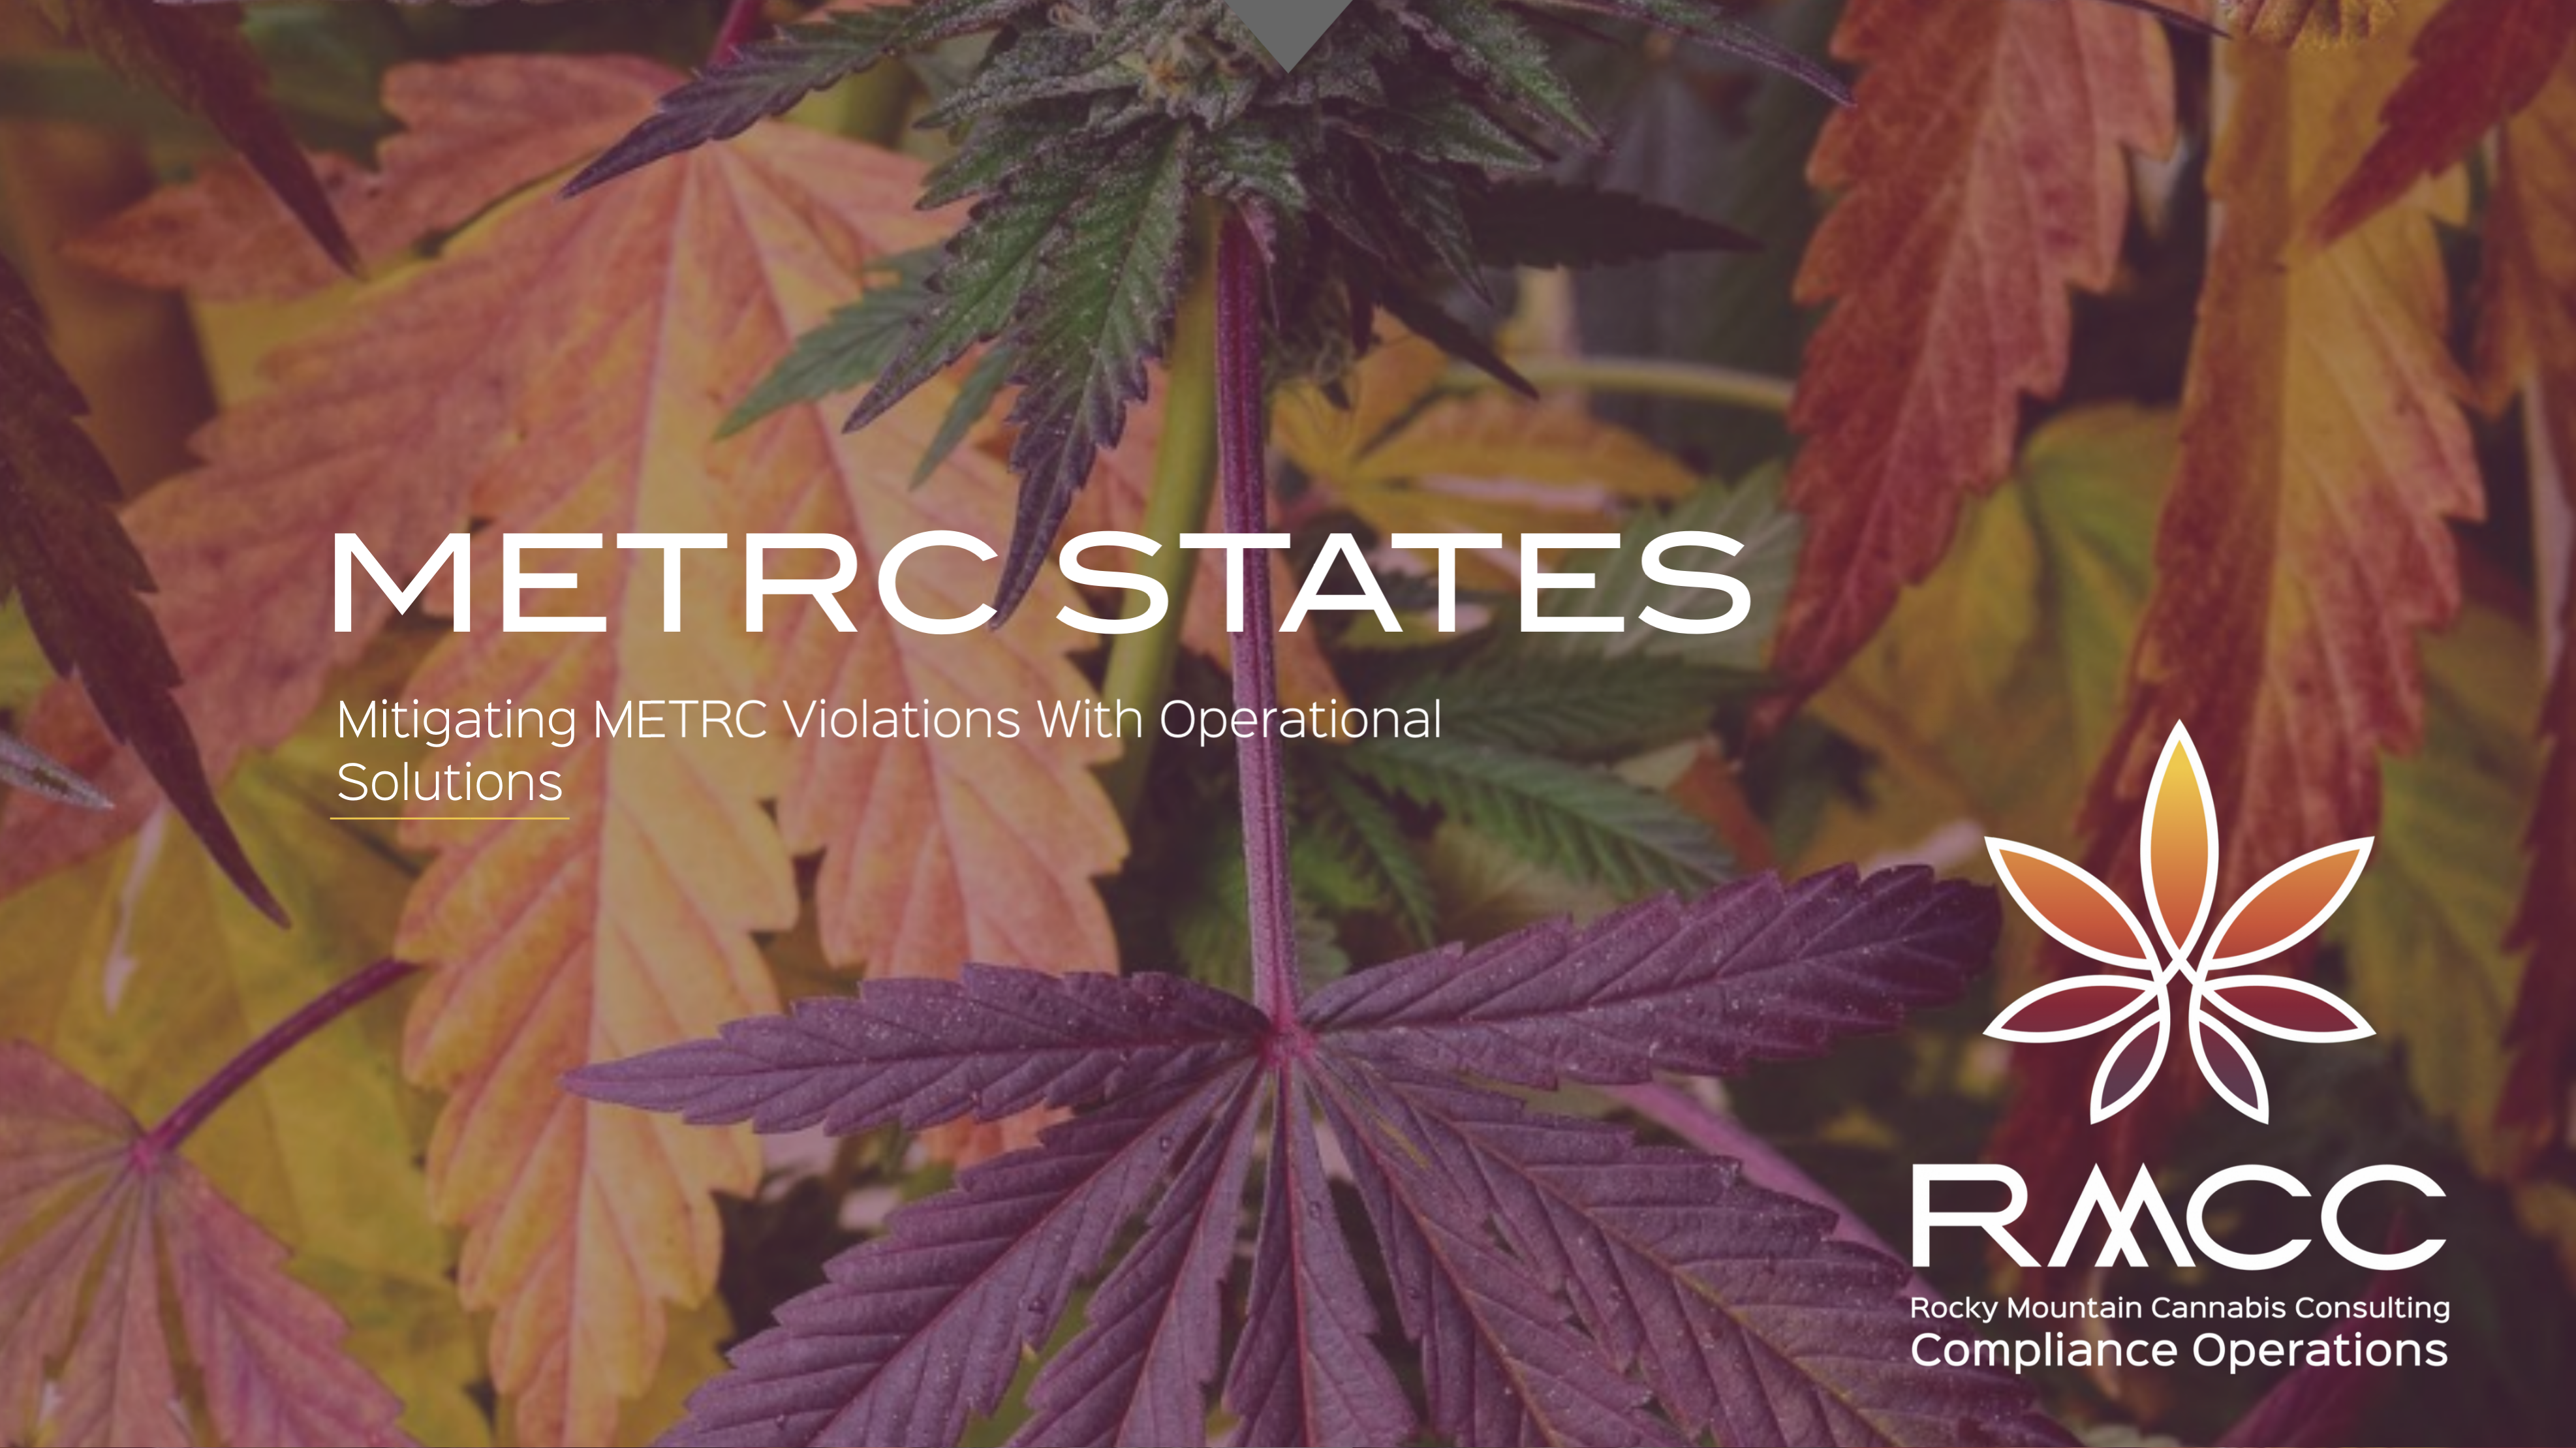 METRC STATES MITIGATING METRC VIOLATIONS WITH OPERATIONAL SOLUTIONS